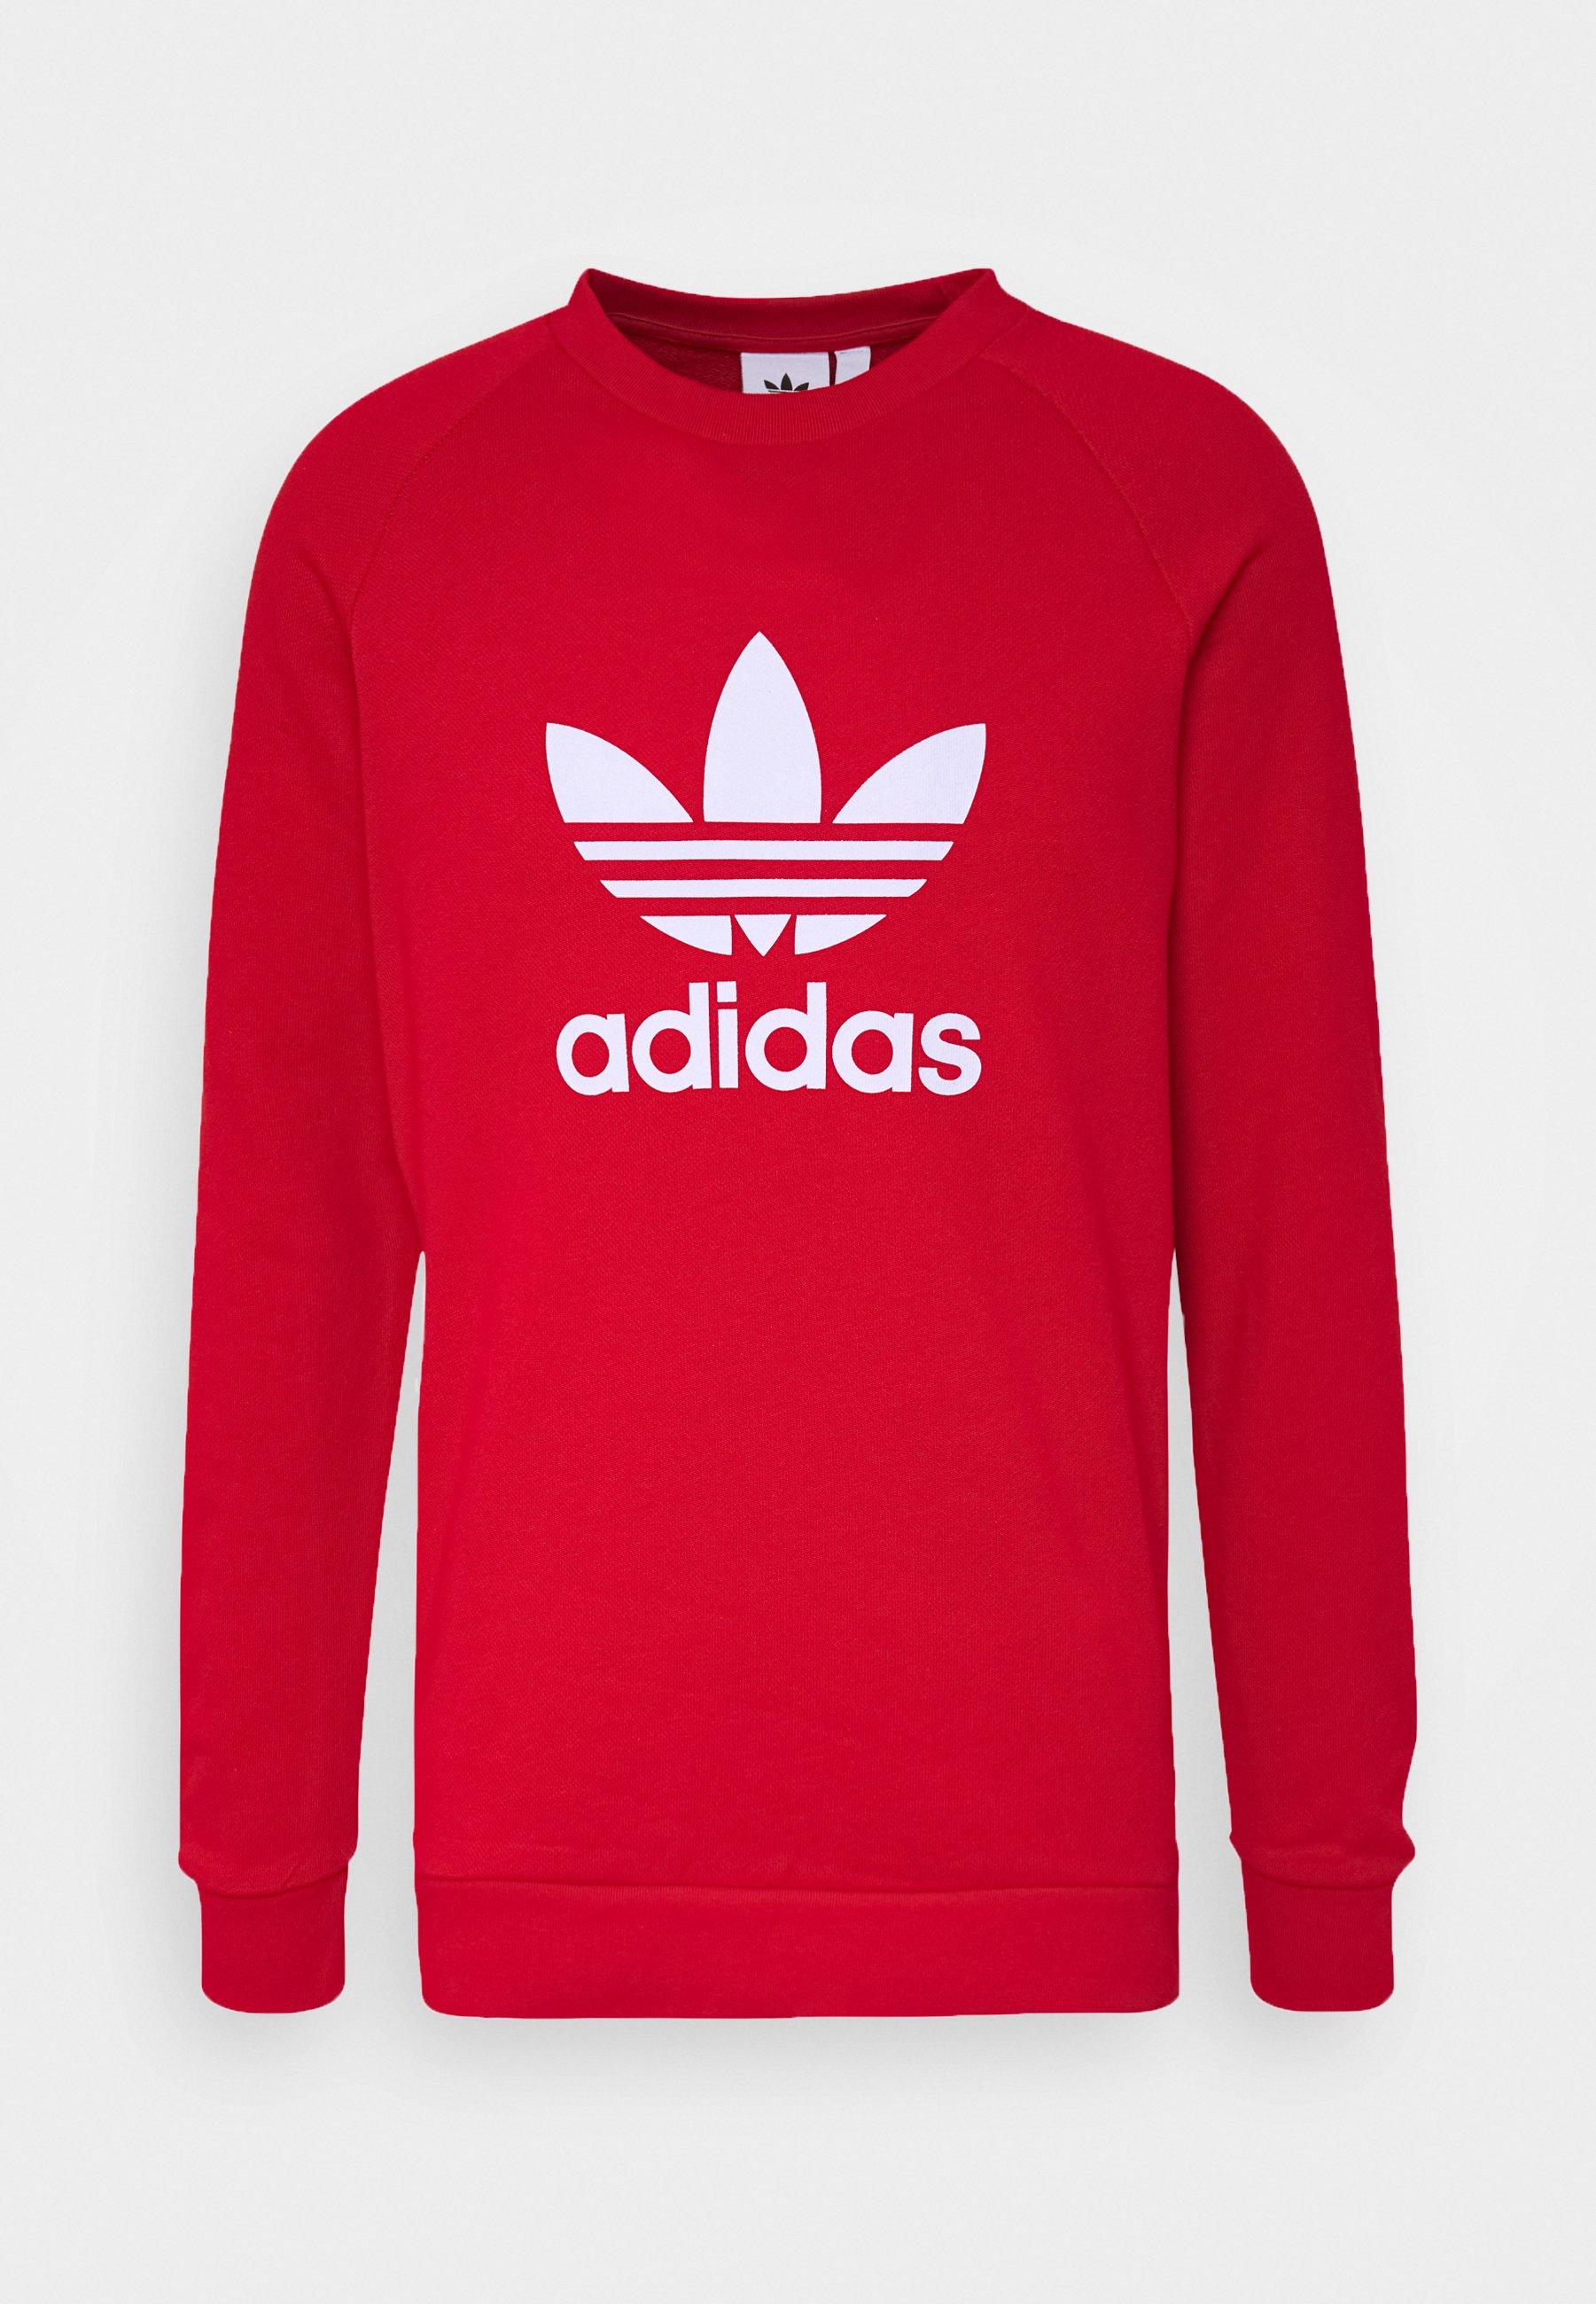 Adidas Sweatshirt online kaufen | ZALANDO